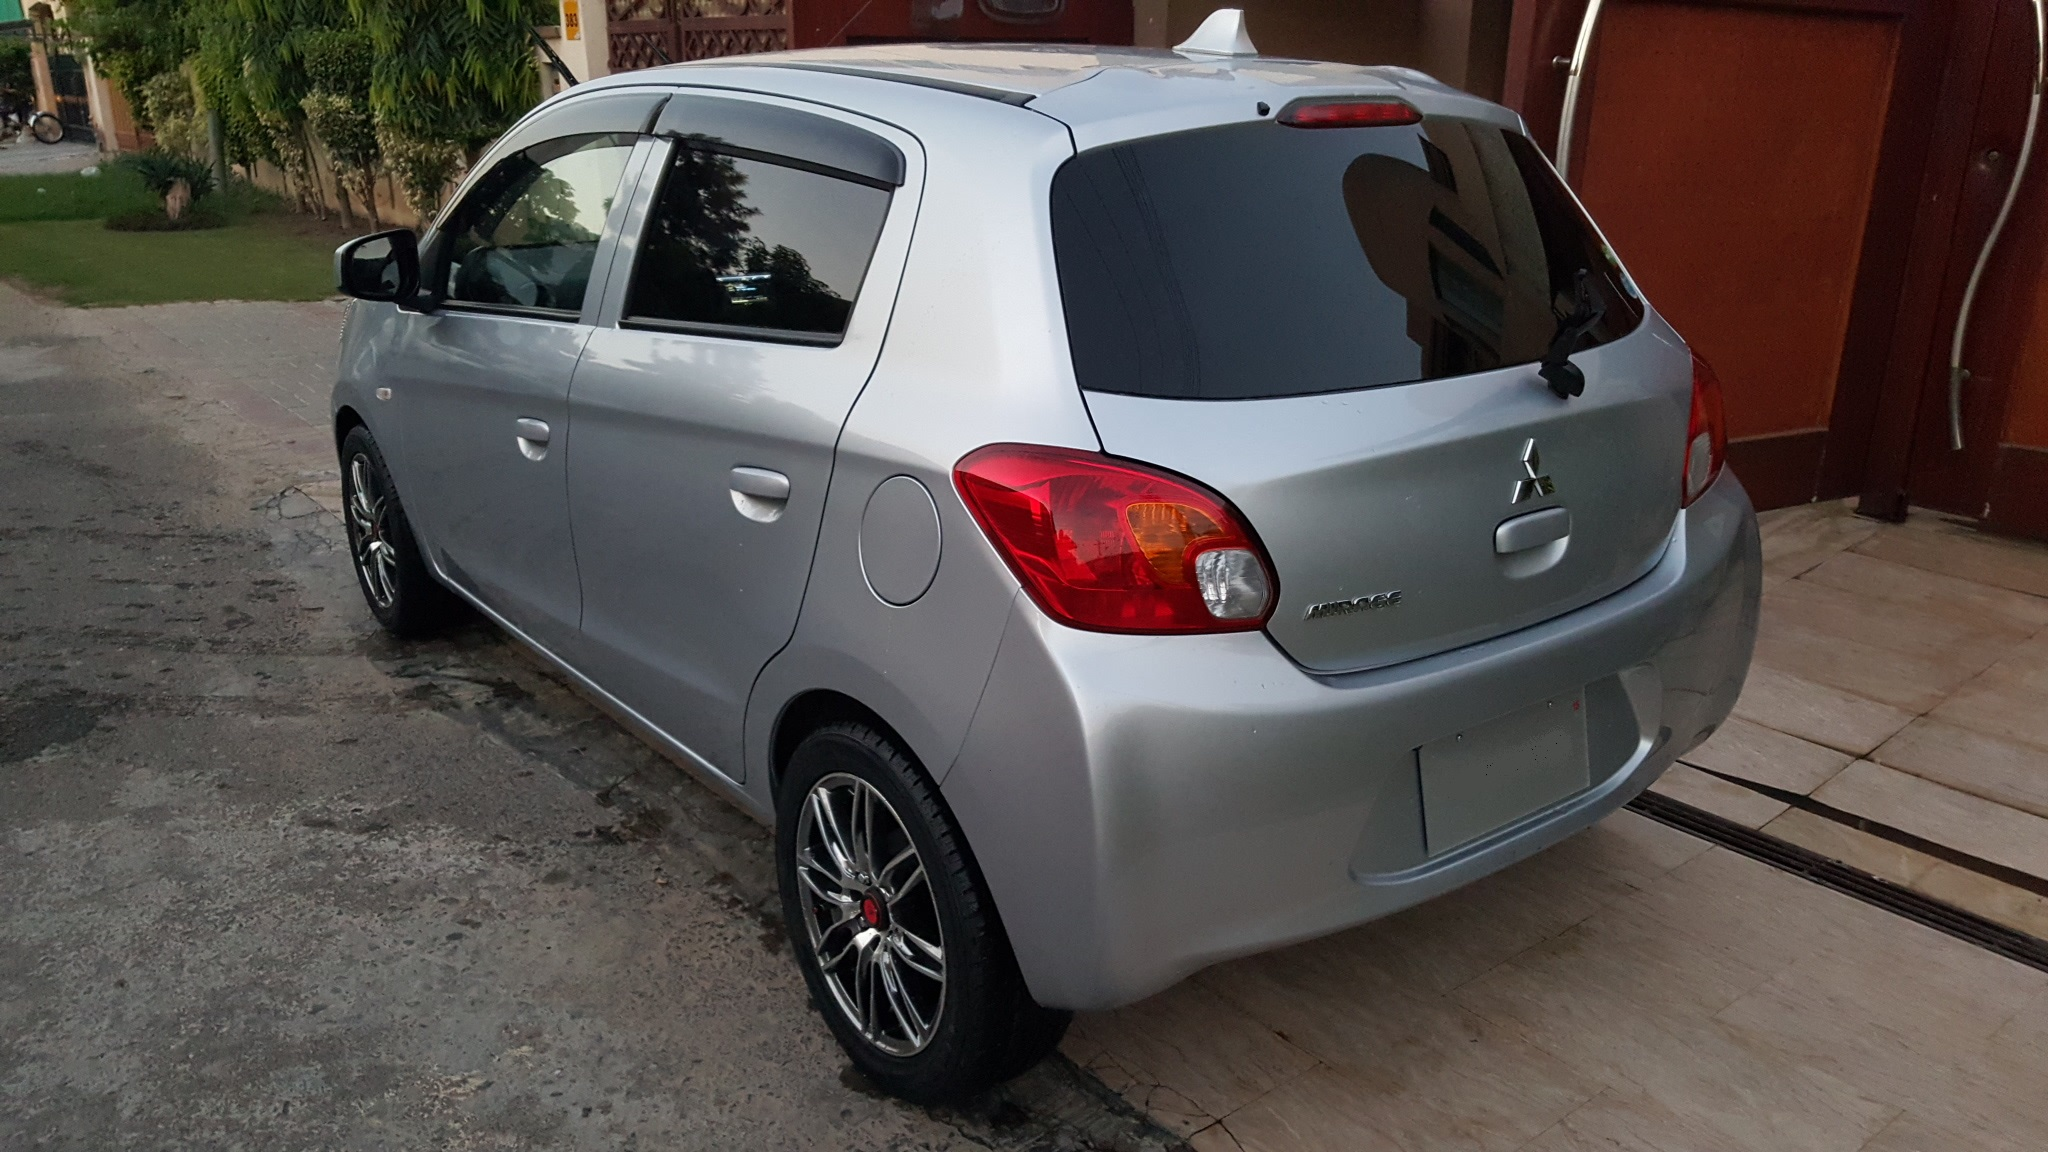 Owners Honda Com >> 2013 Mitsubishi Mirage Owner's Review - PakWheels Blog